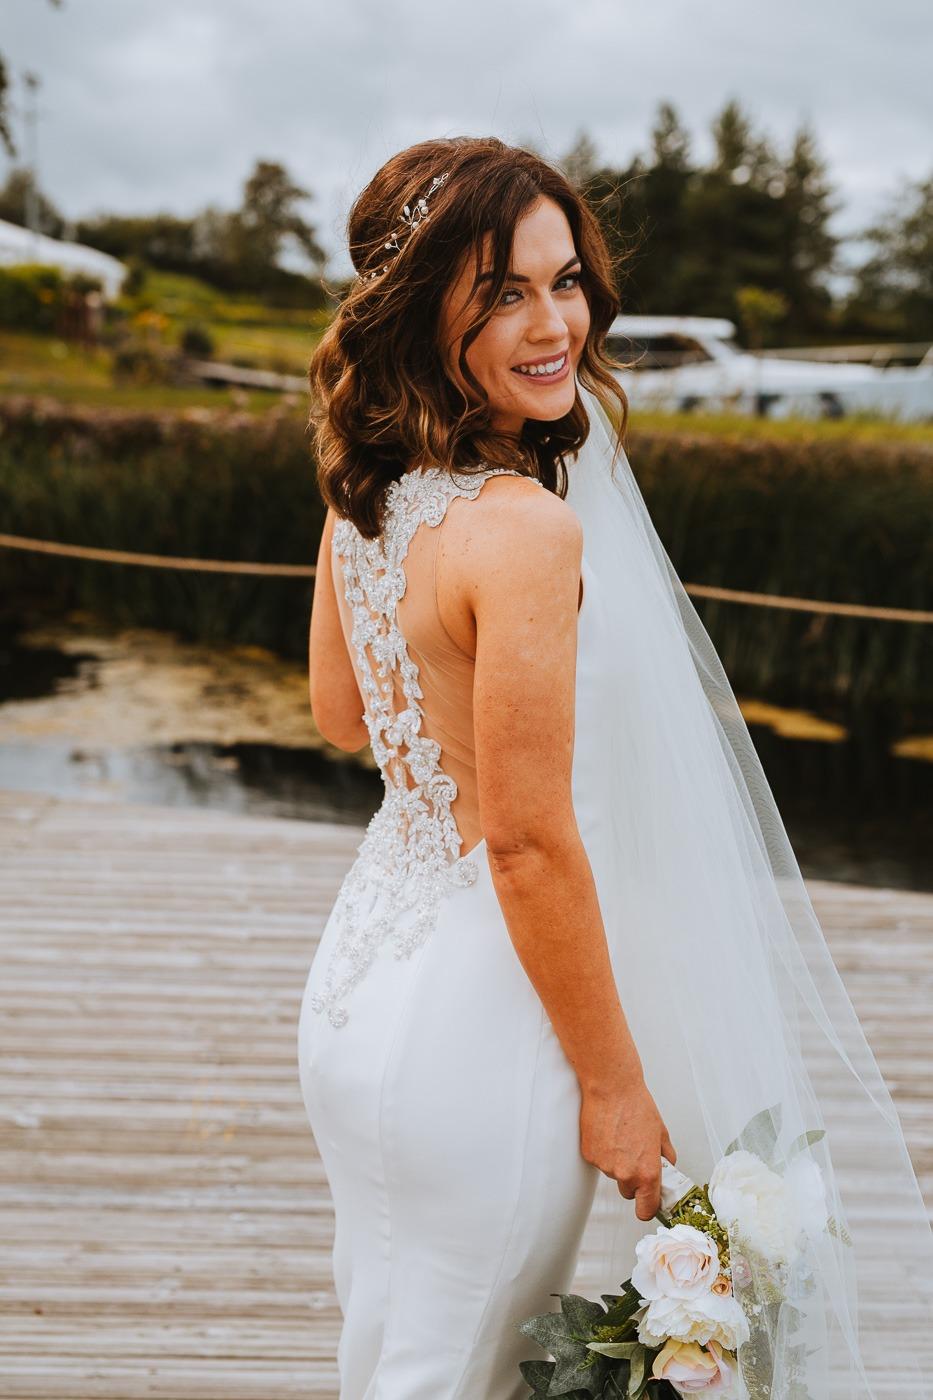 A woman in a white dress